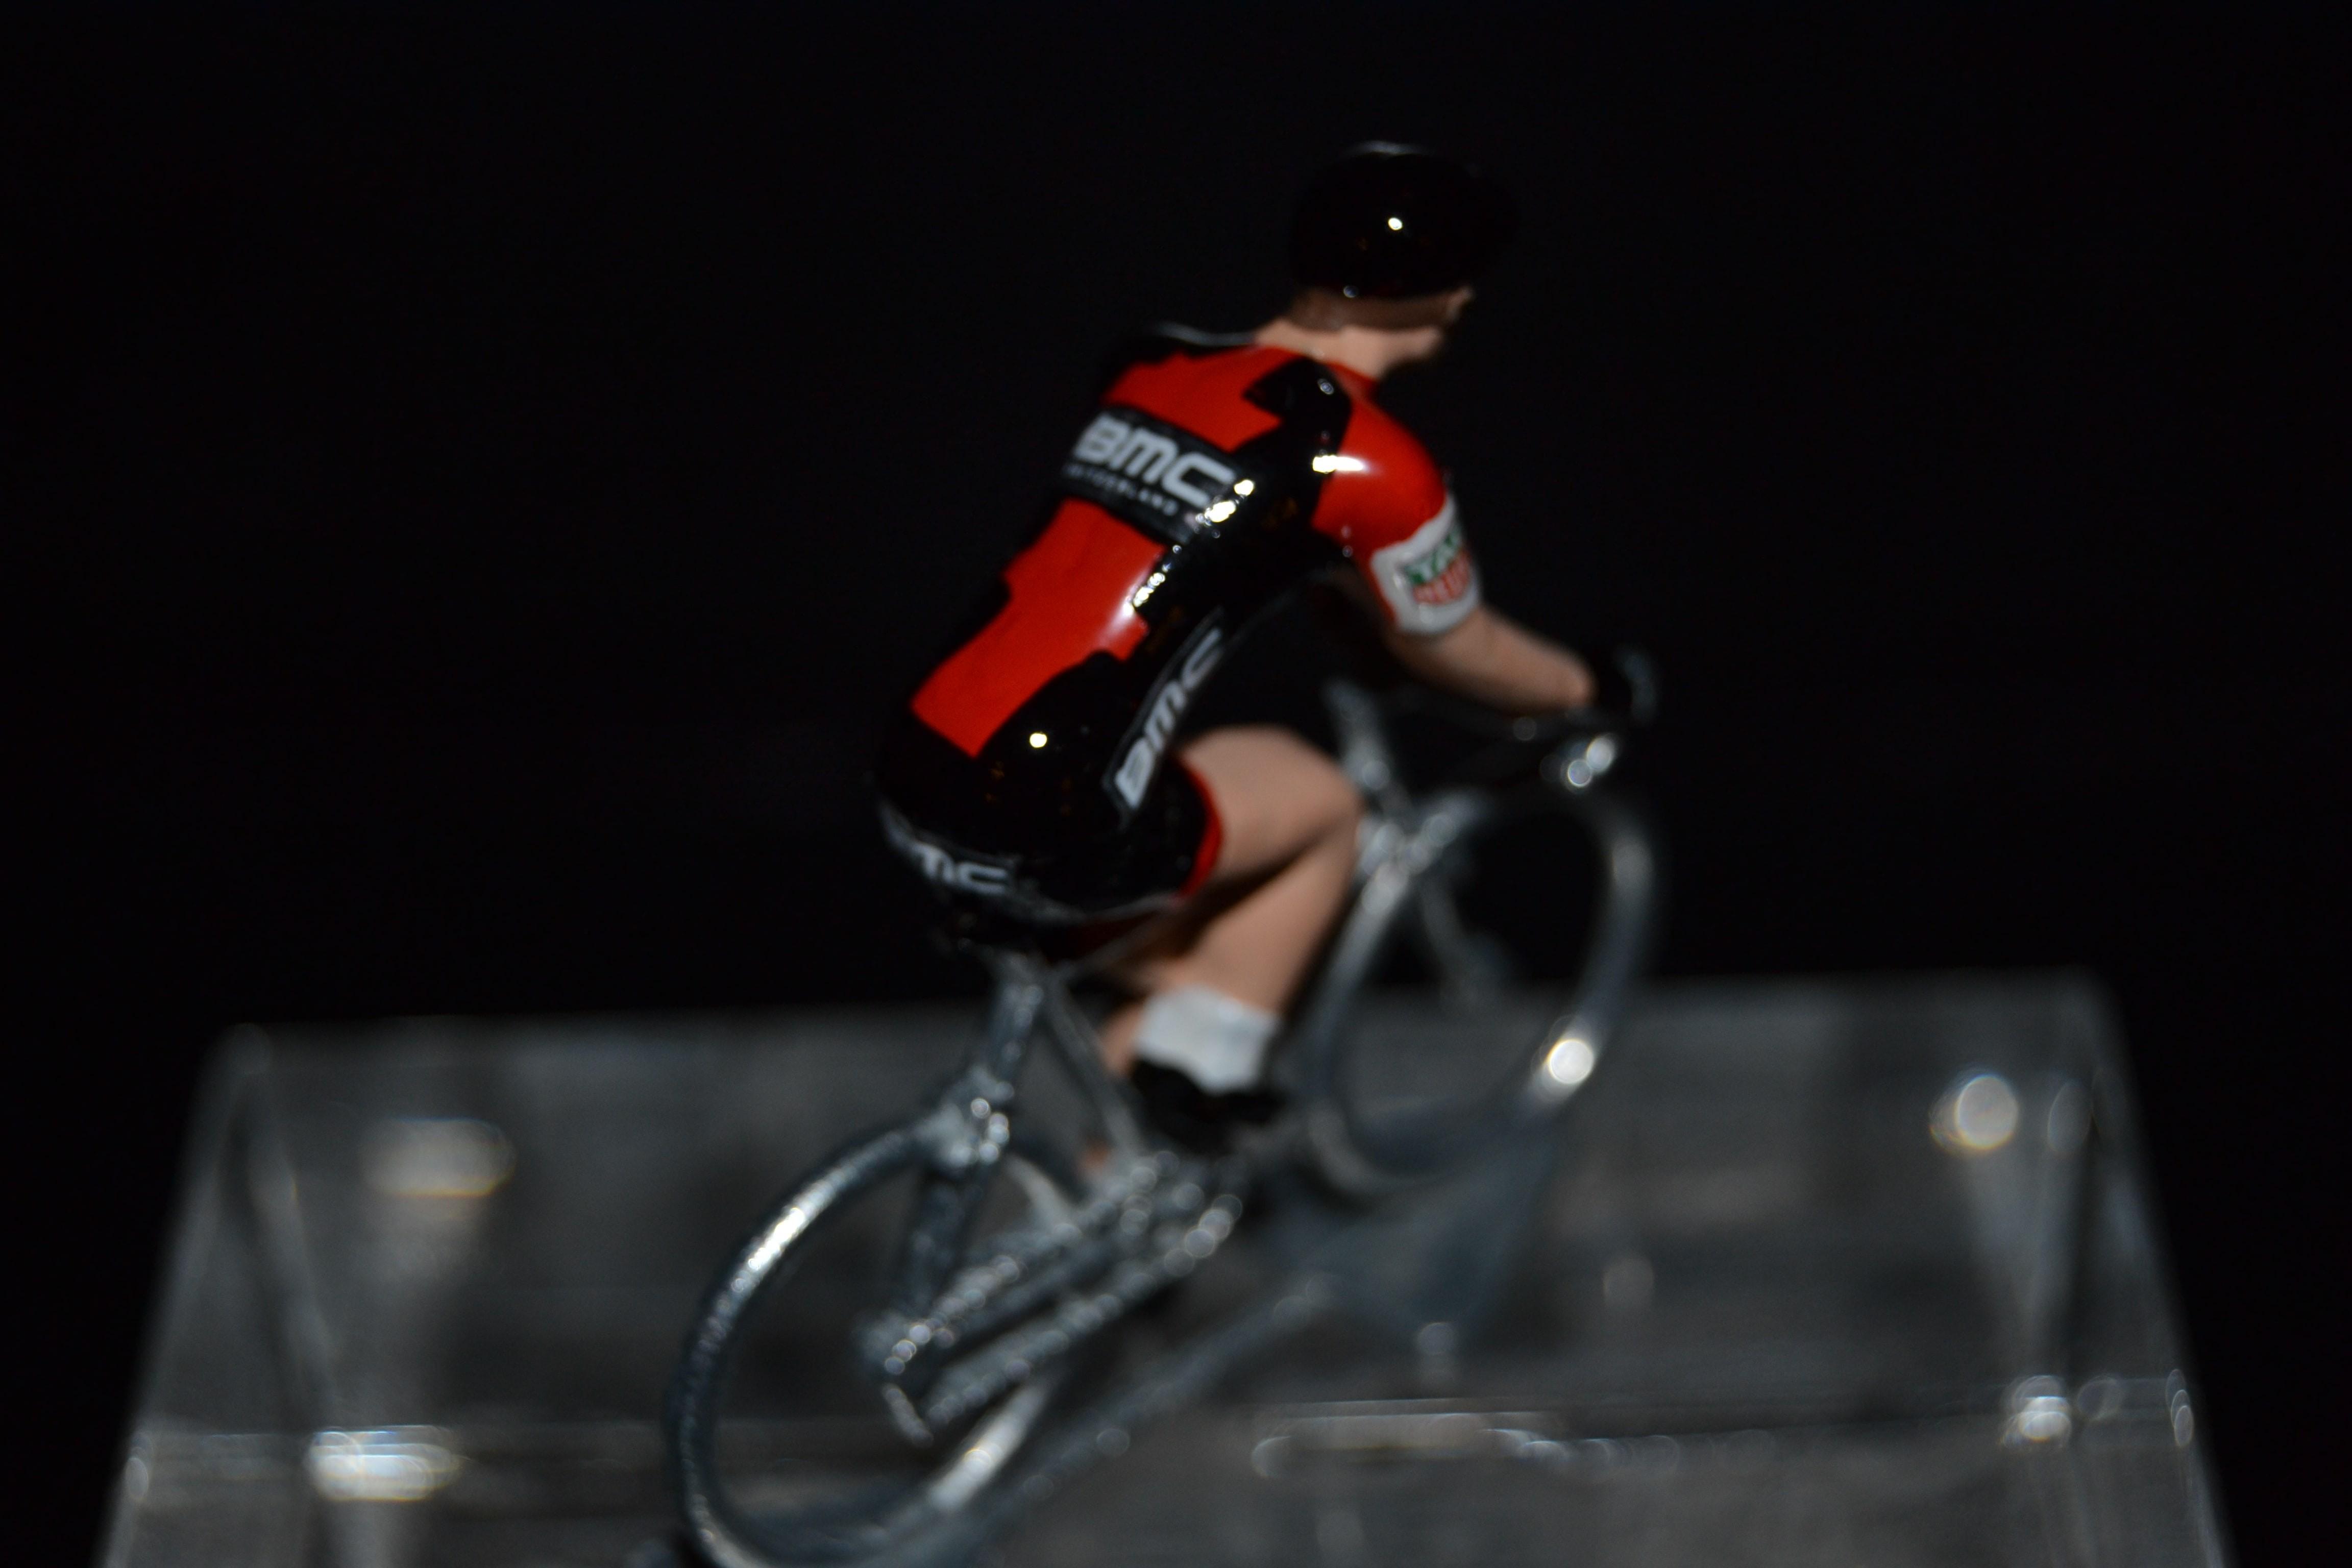 Petit cycliste Figurine BMC racing 2018 Cycling figure